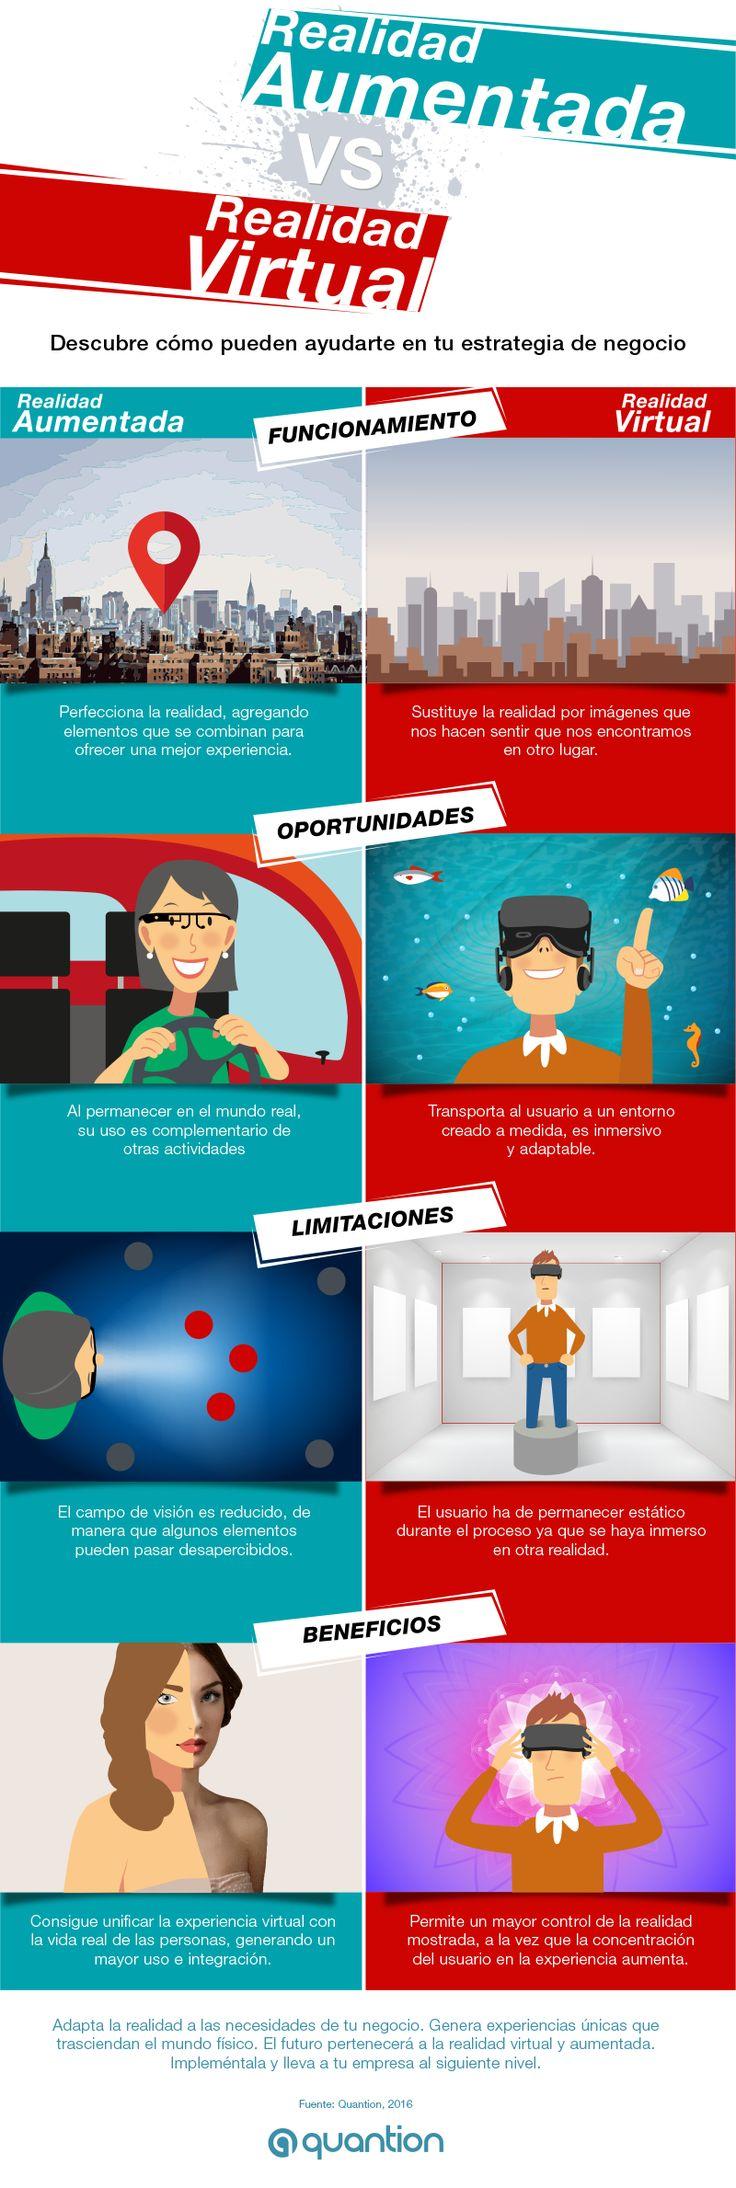 Realidad Aumentada vs Realidad Virtual #infografia #infographic #tech